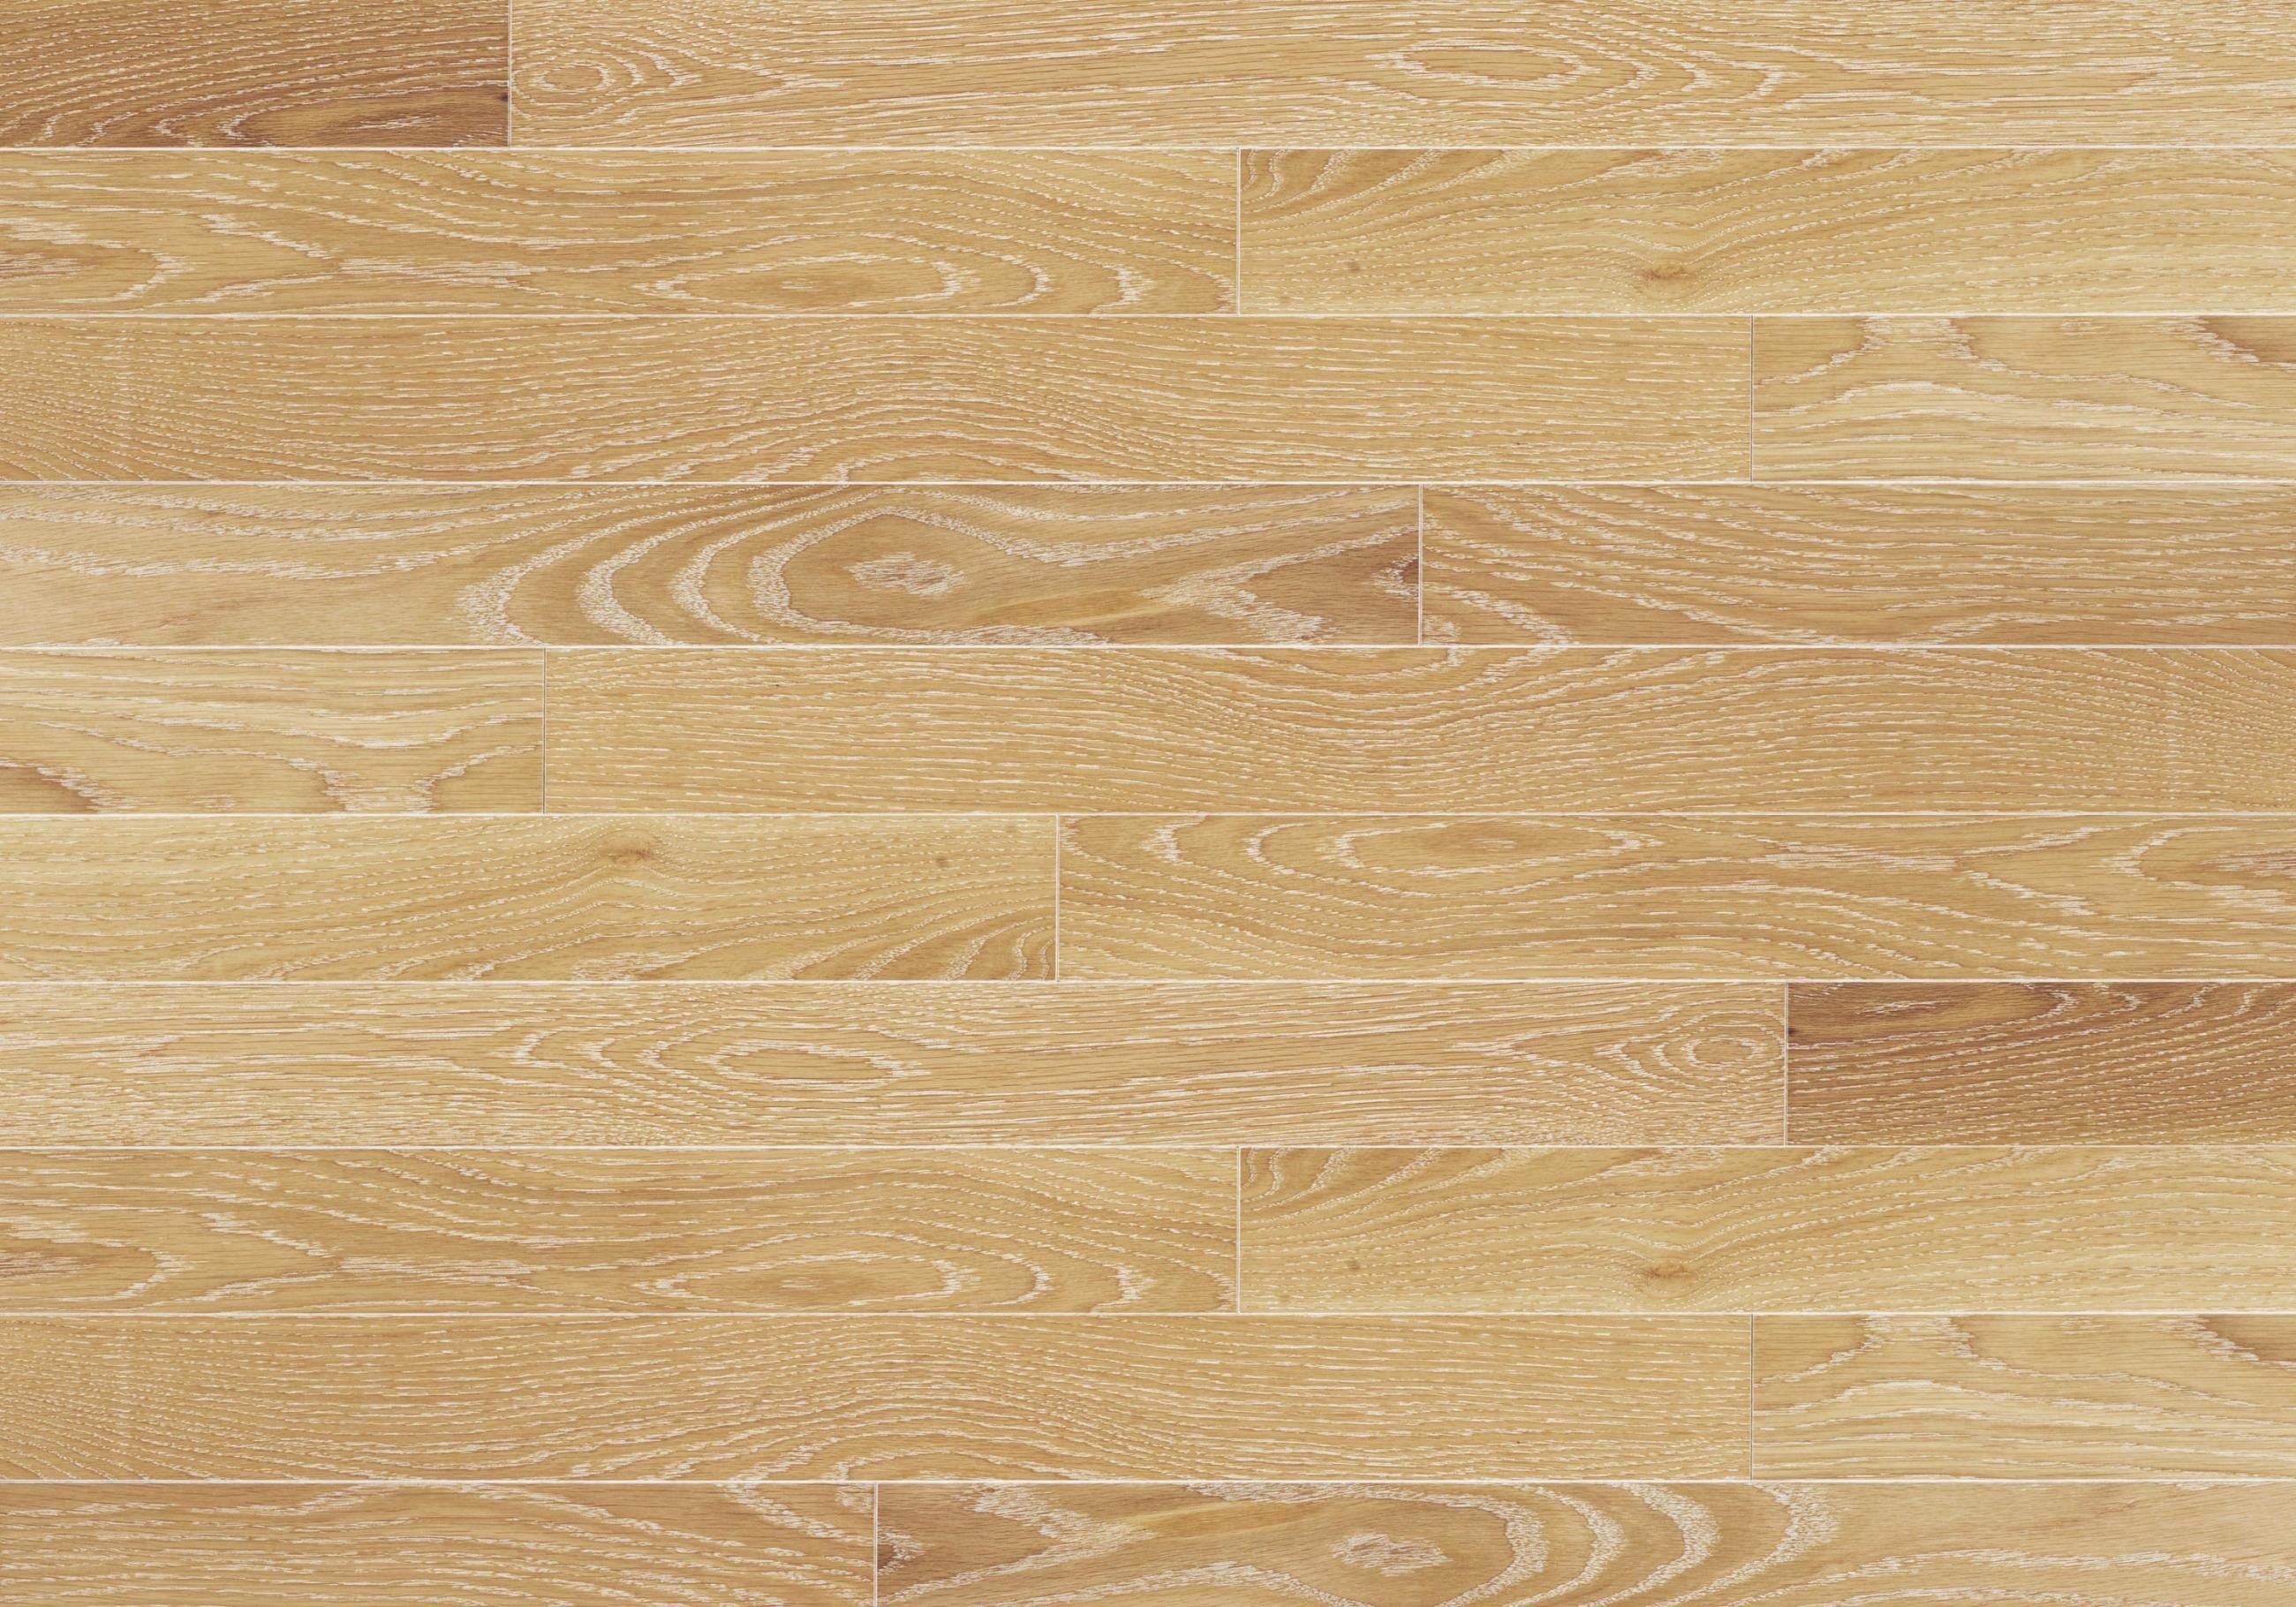 Beachwood, Designer, White Oak, Pacific / Exclusive | Lauzon Hardwood  Flooring